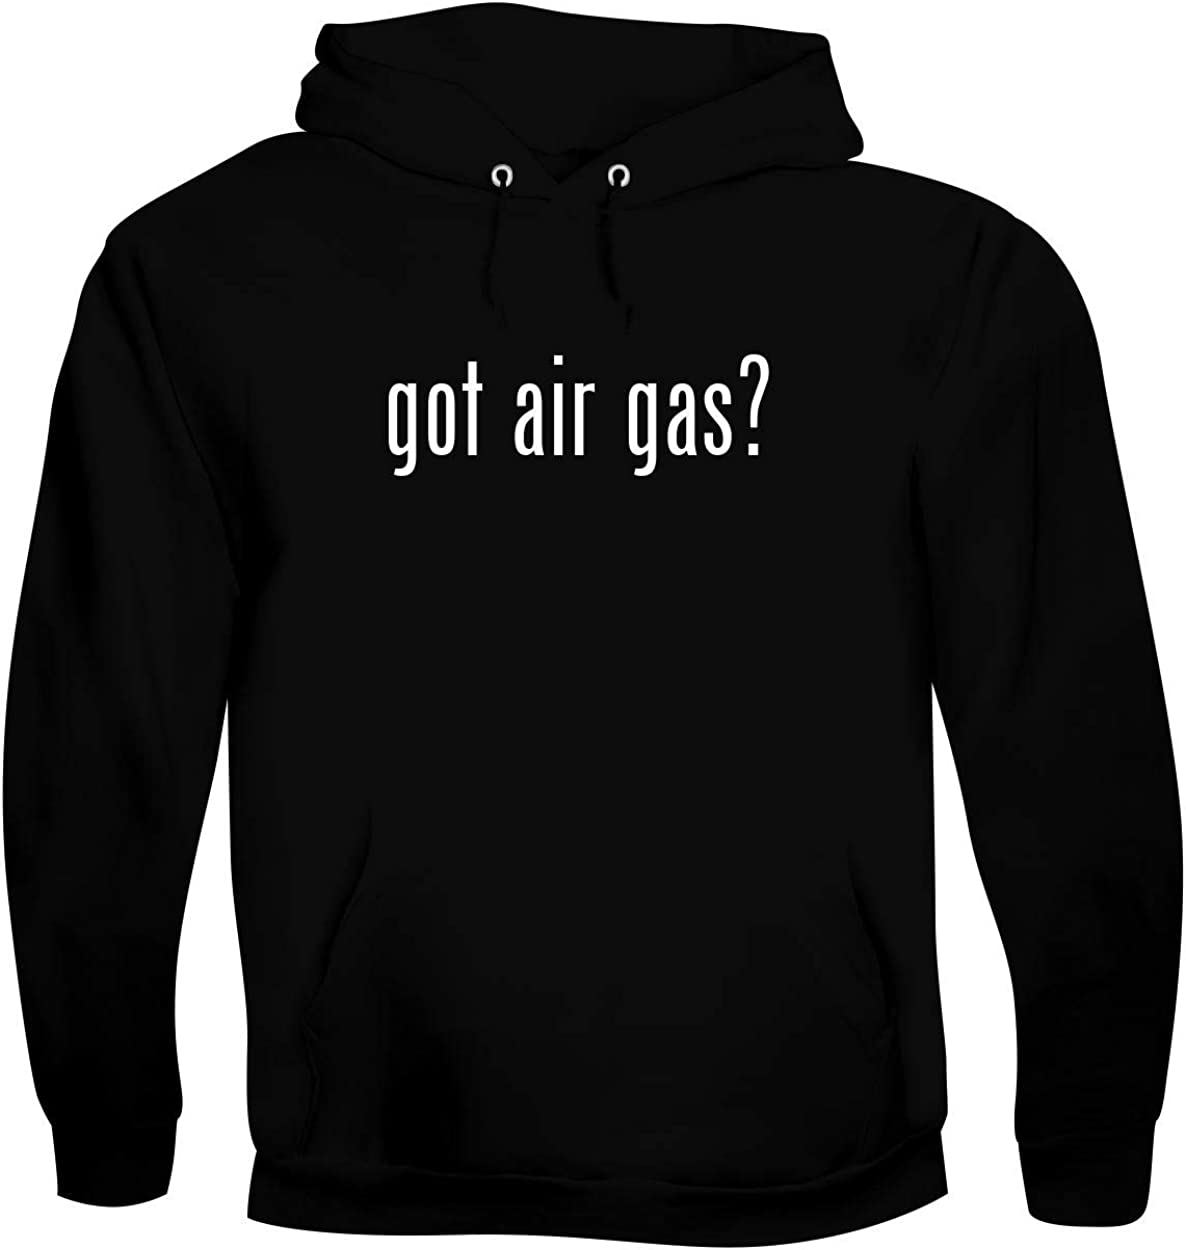 got air gas? - Men's Soft & Comfortable Hoodie Sweatshirt